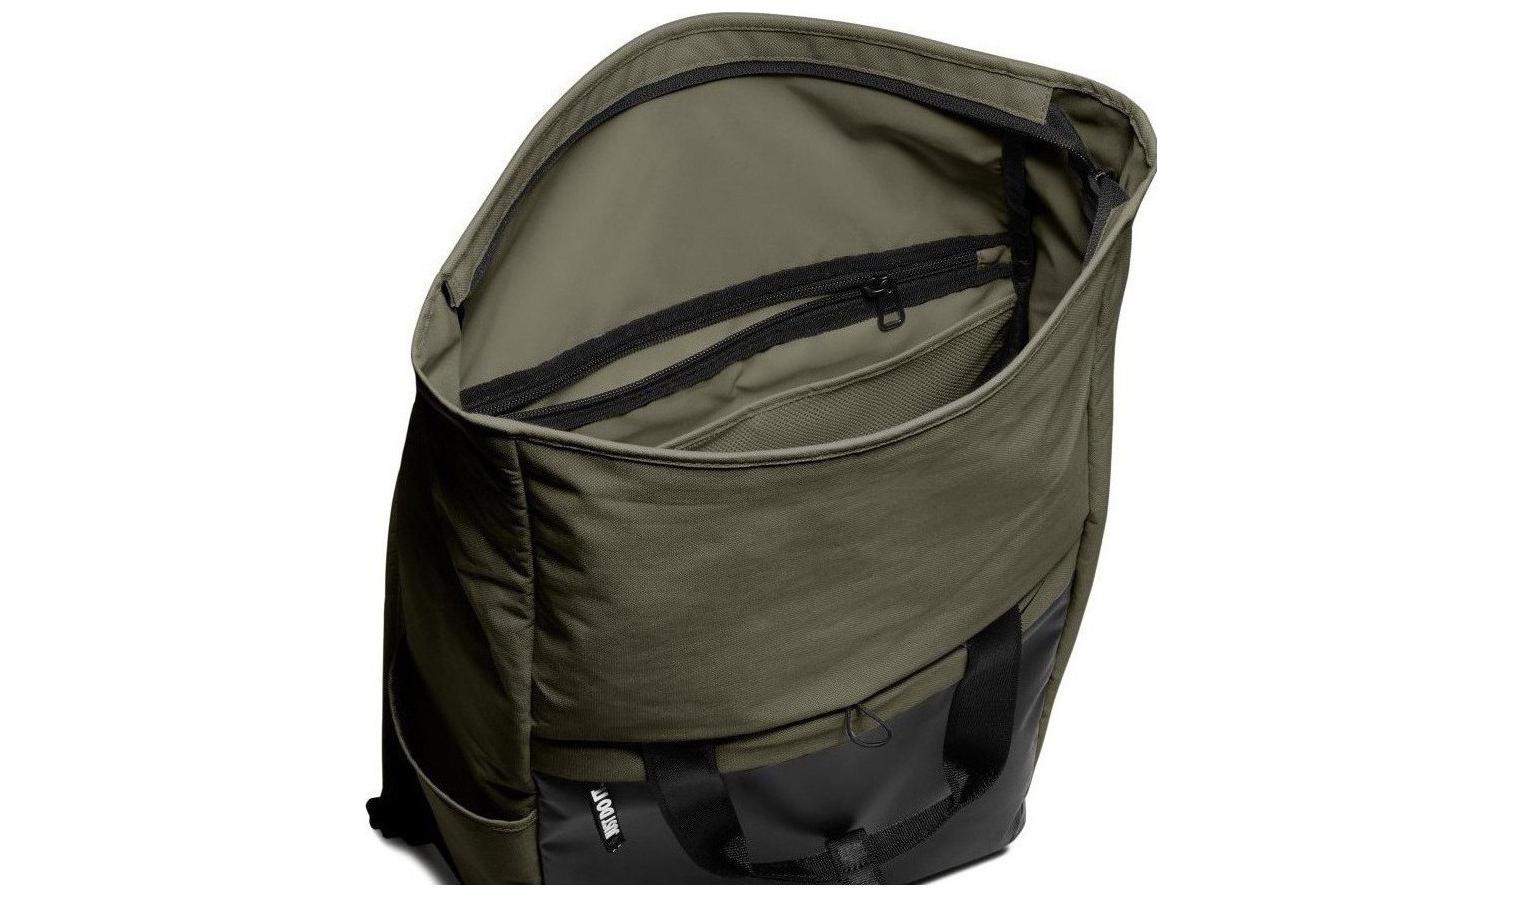 c1342779343 Dámský batoh Nike RADIATE W zelený